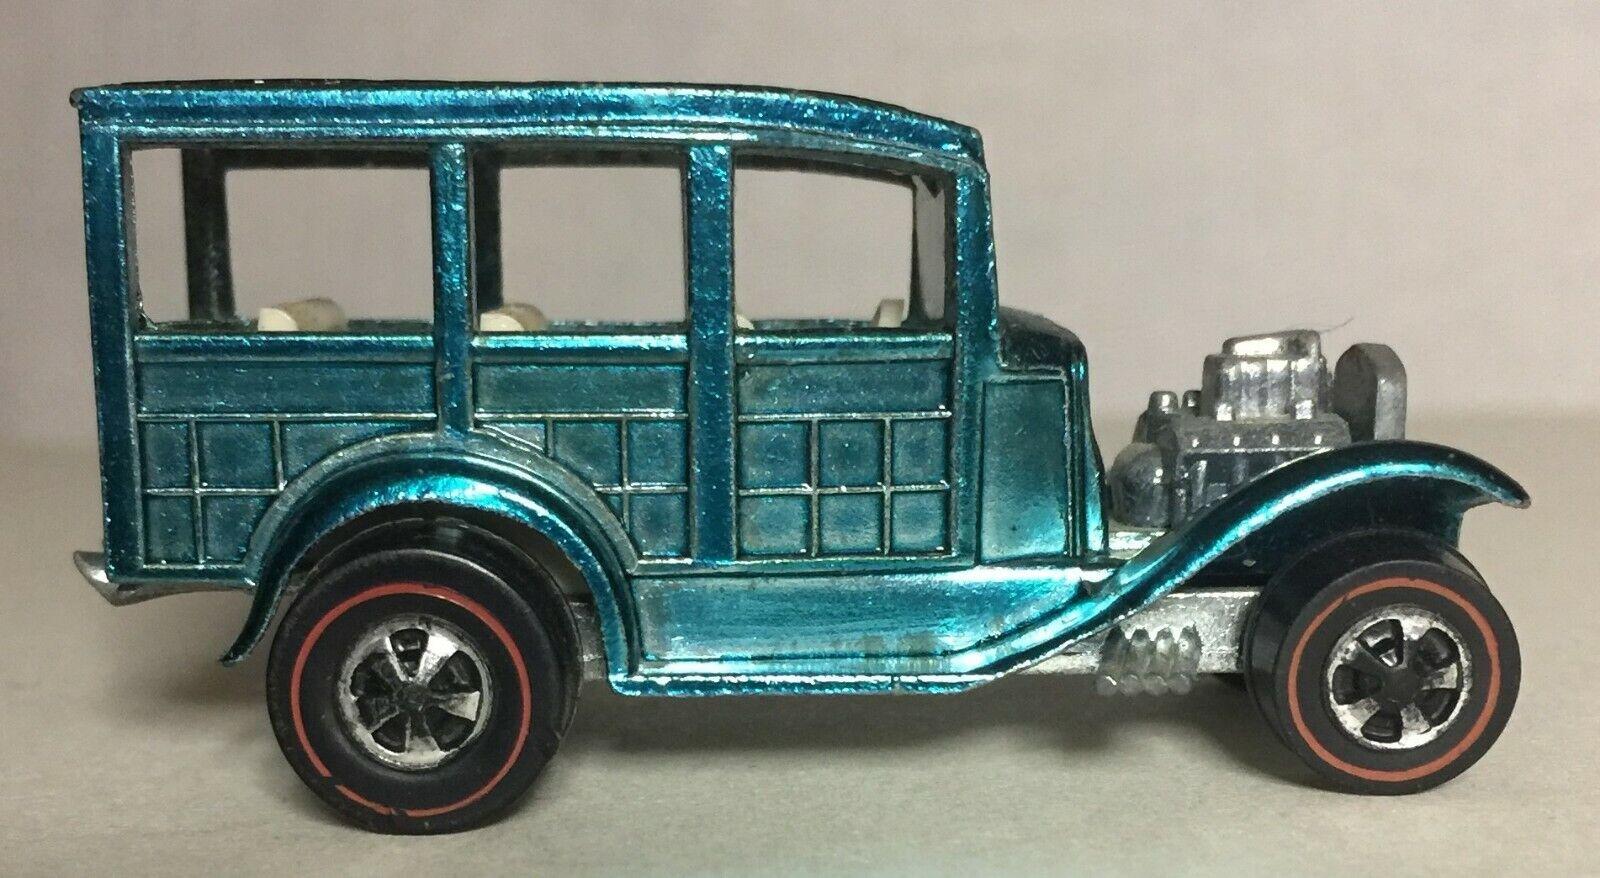 goditi il 50% di sconto Light blu classeic 31 Ford Woody rossoline 1969 Caliente Caliente Caliente Ruedas w  bianca Interior  6251  più ordine